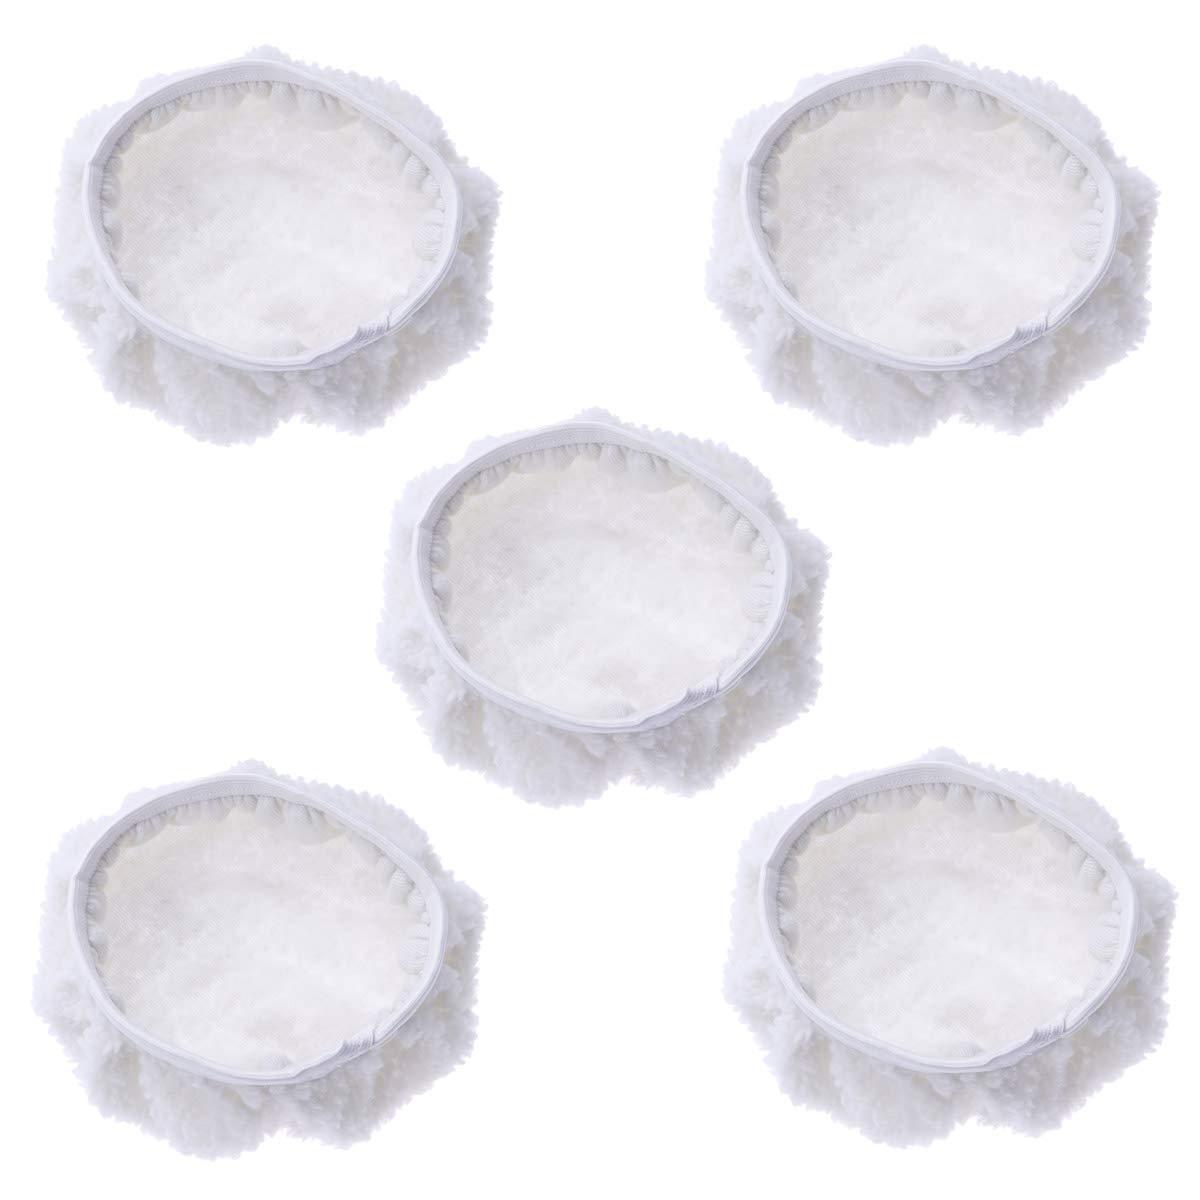 VORCOOL 5pcs Car Polishing Waxing Lambswool Bonnets Pads - 9-10 inch (White)